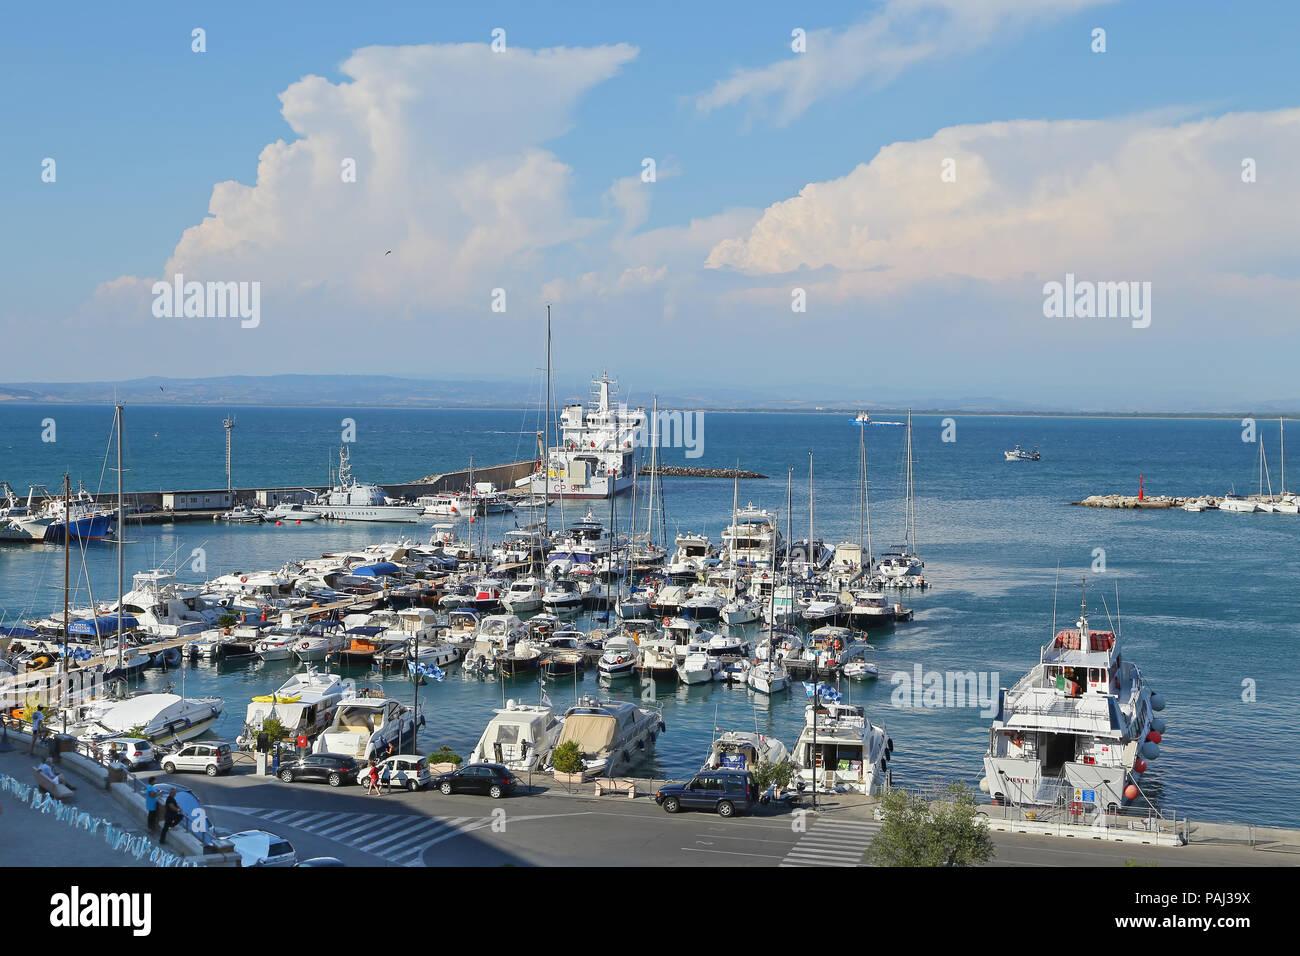 GIGLIO ISLAND, ITALY - JULY 18, 2014:Boats in the small harbor of 'Porto Santo Stefano', the pearl of the Mediterranean Sea, Tuscany - Italy - Stock Image